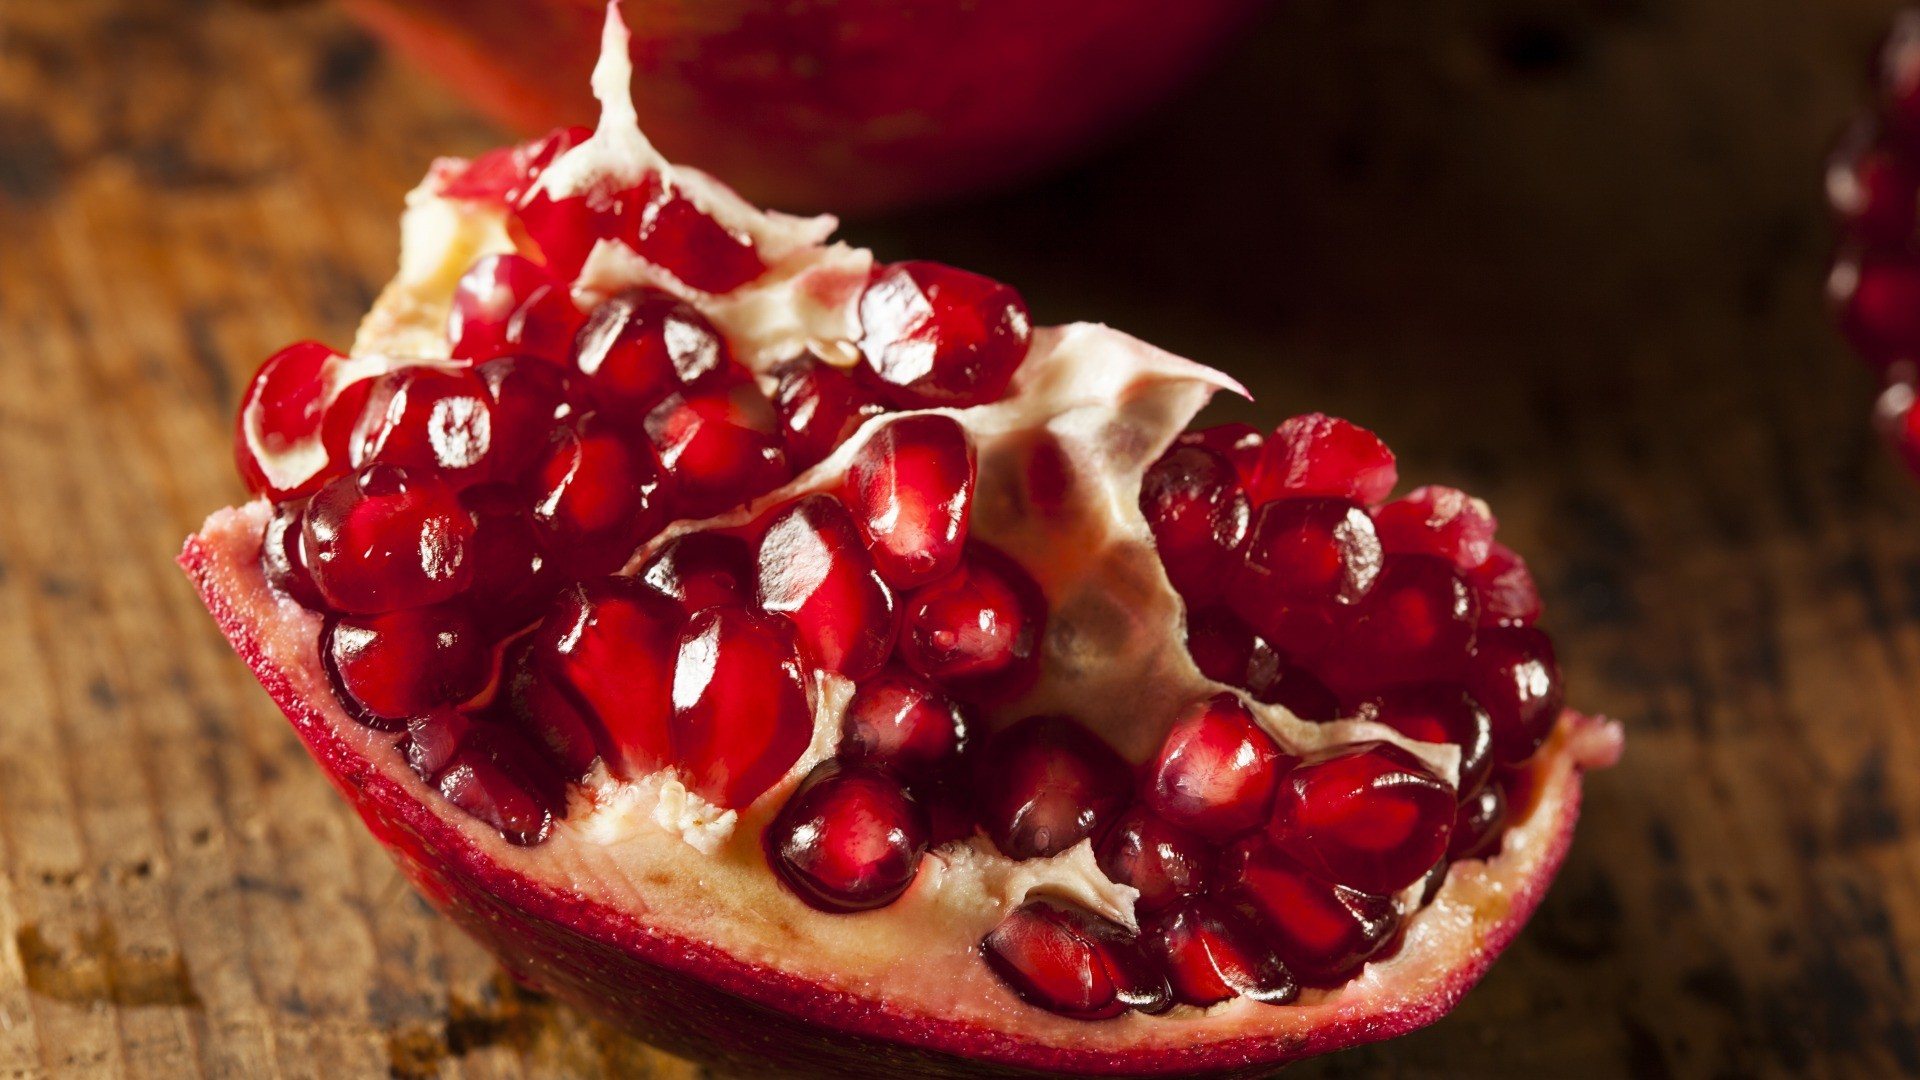 Pomegranate screen wallpaper